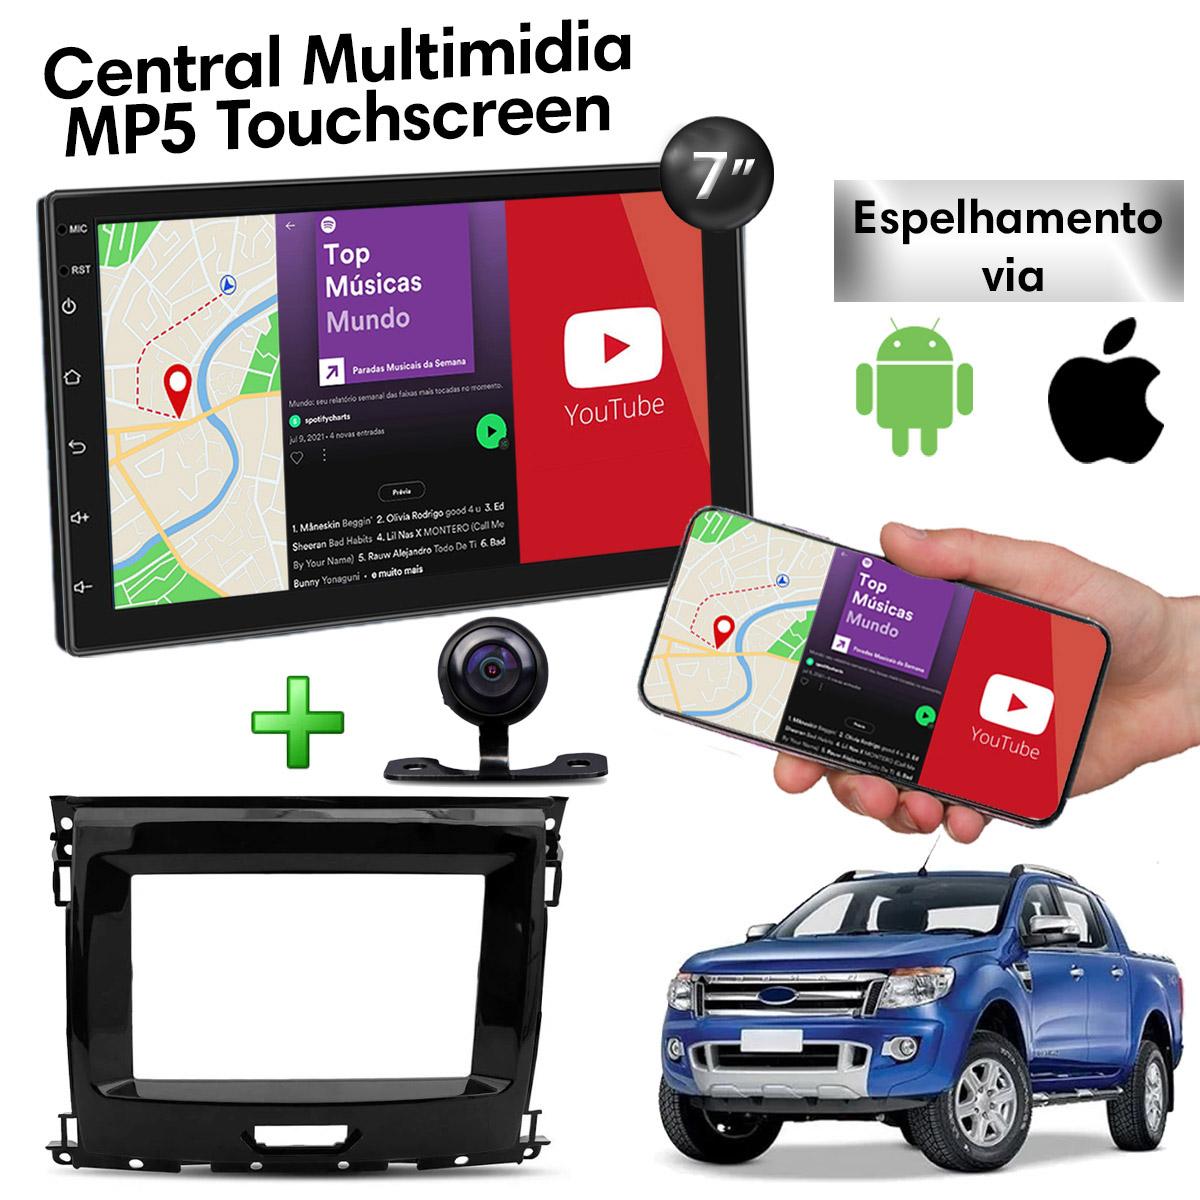 Central Multimidia com Moldura Ford Ranger Mp5 Bluetooth Usb Touchscreen 7 Polegadas 2 Din  Atacado